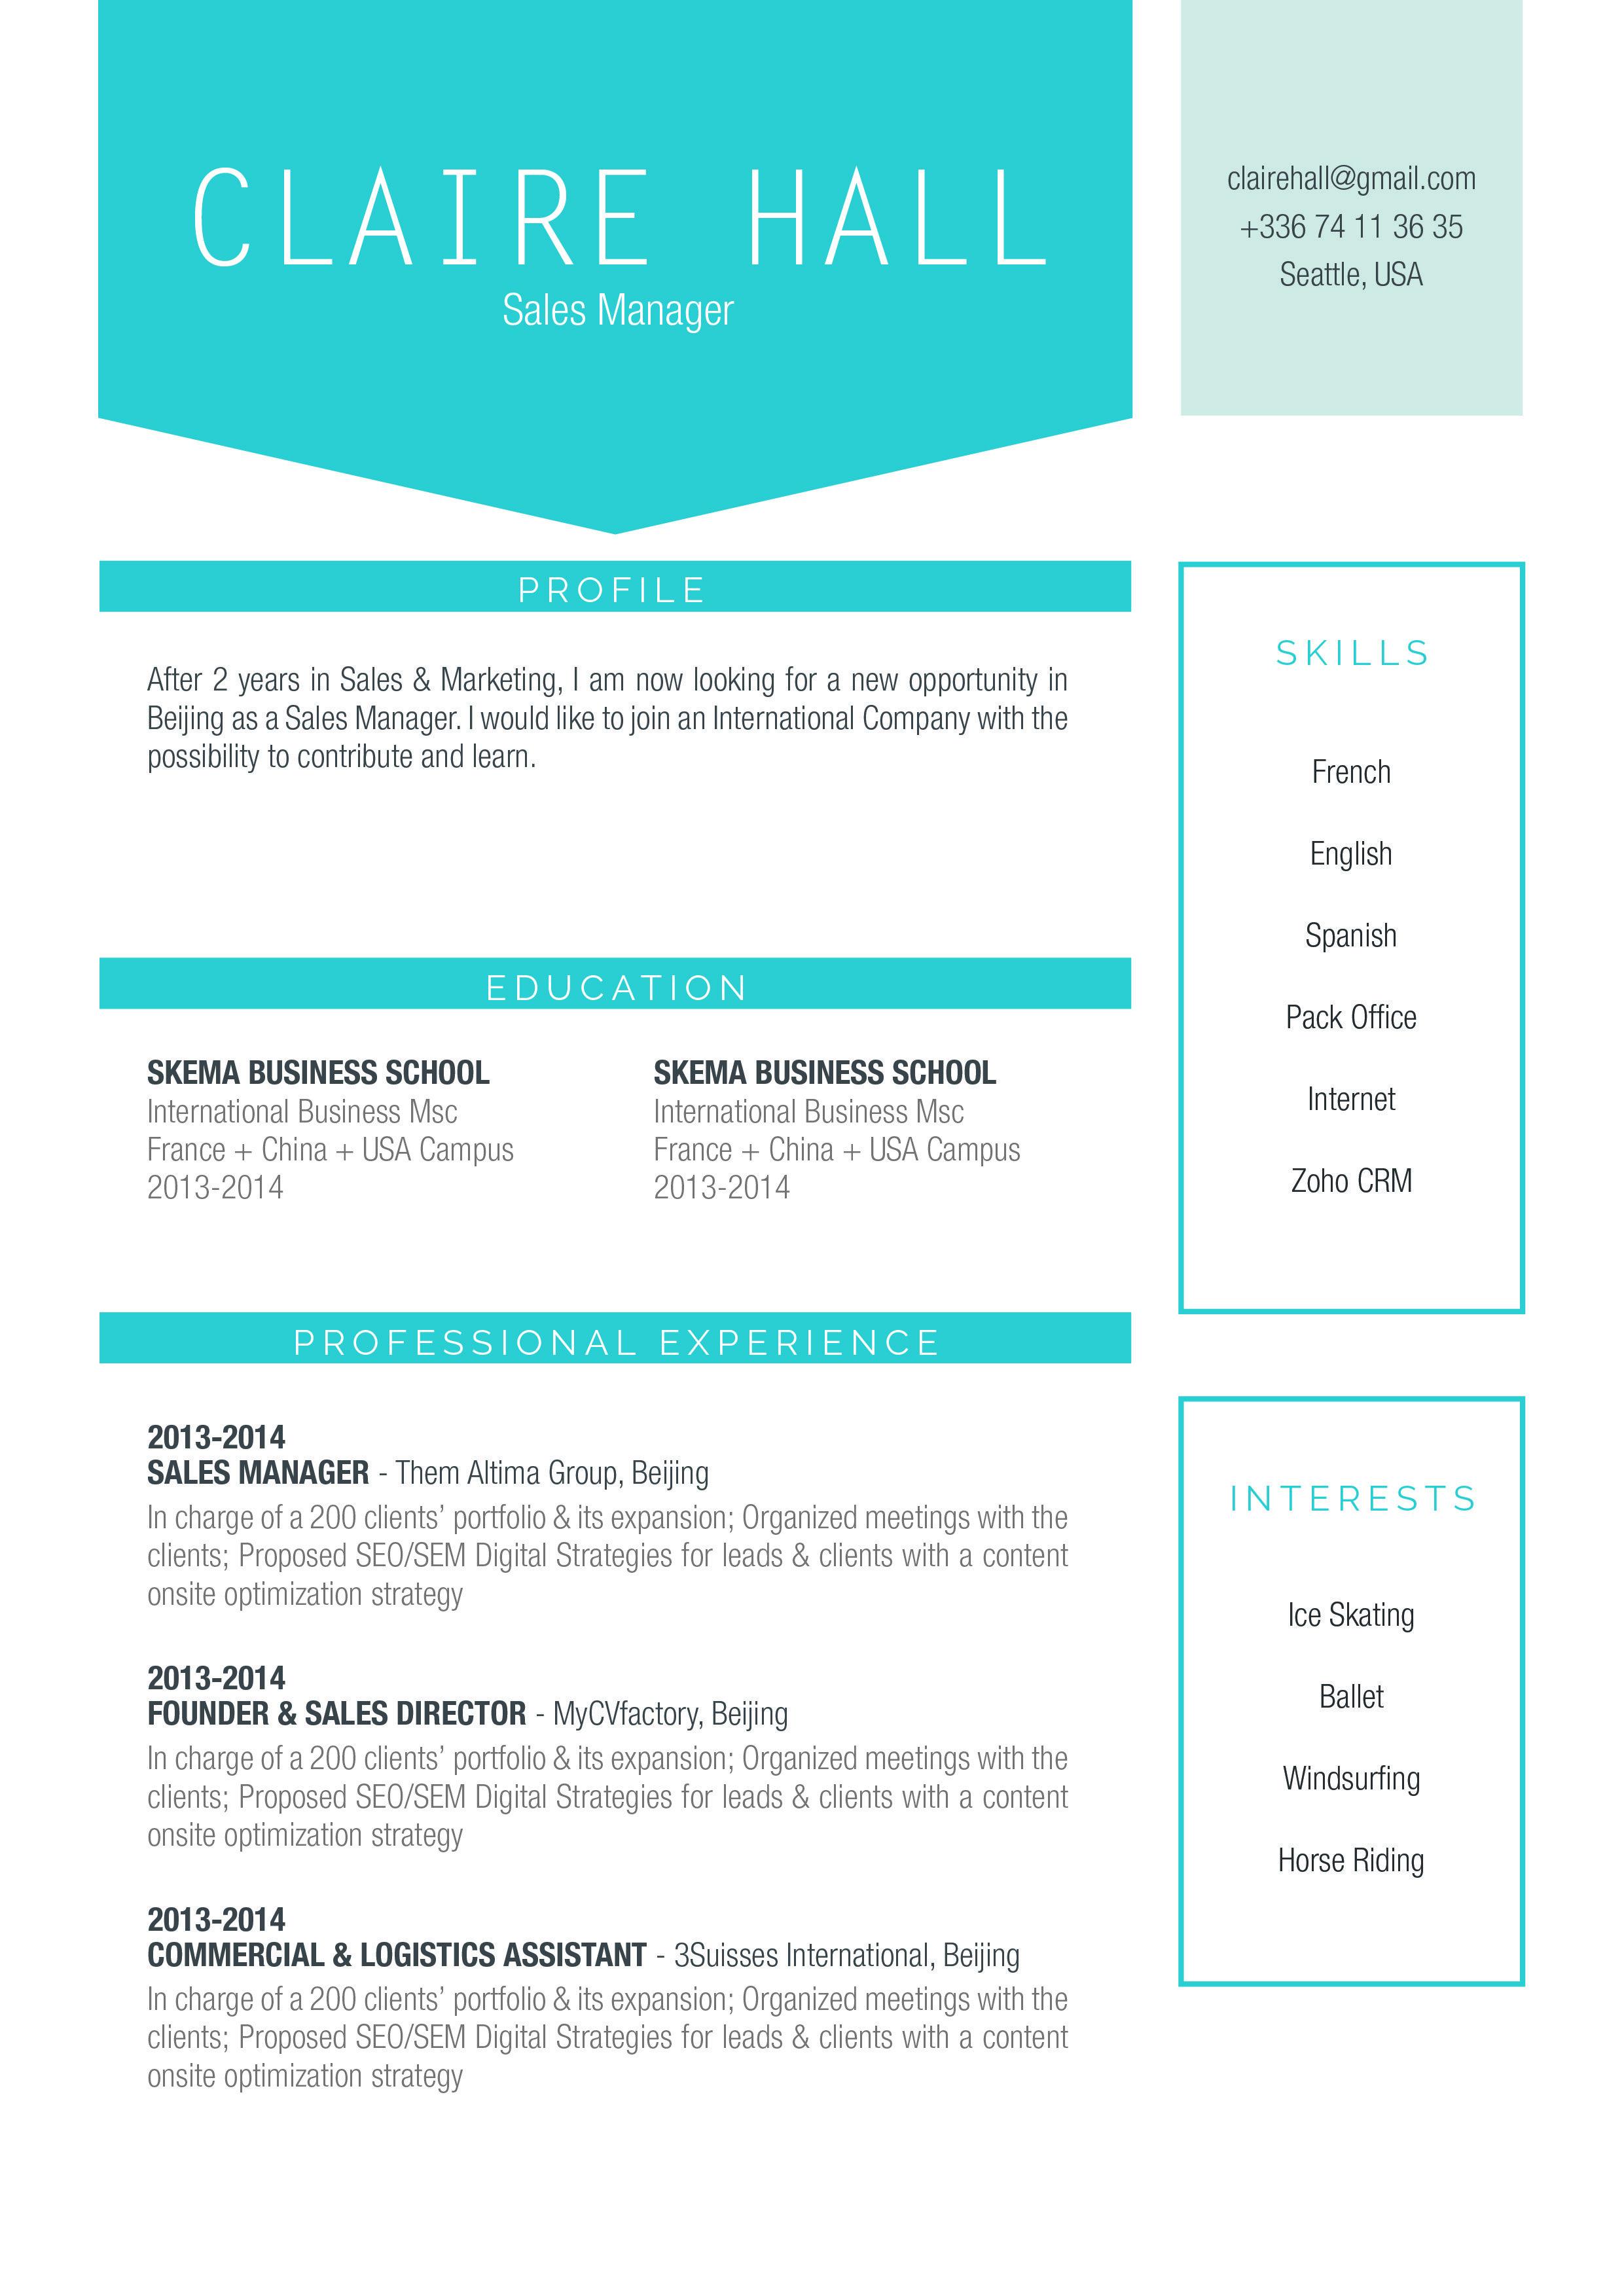 resume-builder-mycvfactory-valiant-0.jpg